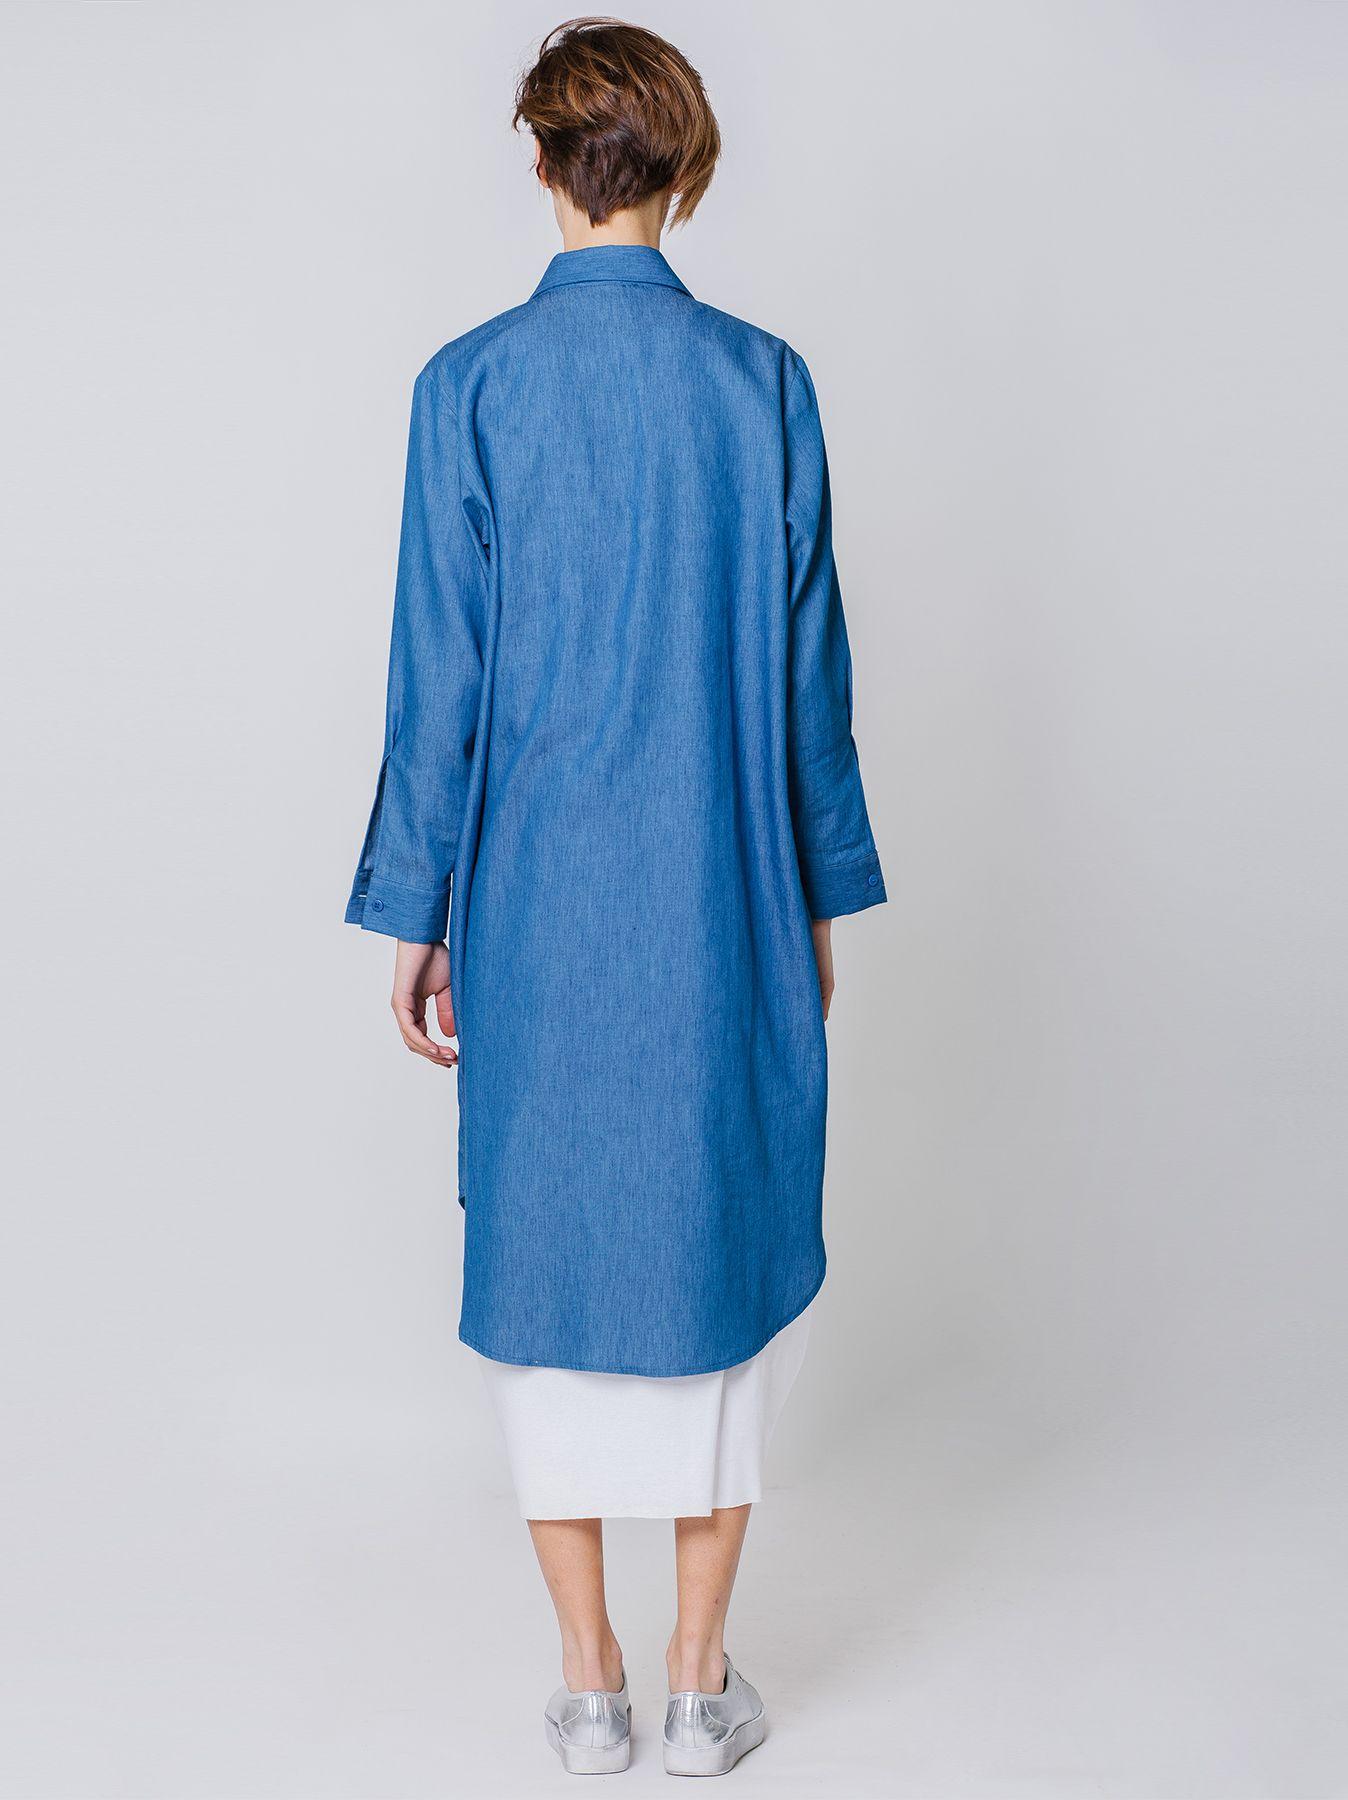 Camicia lunga chambray